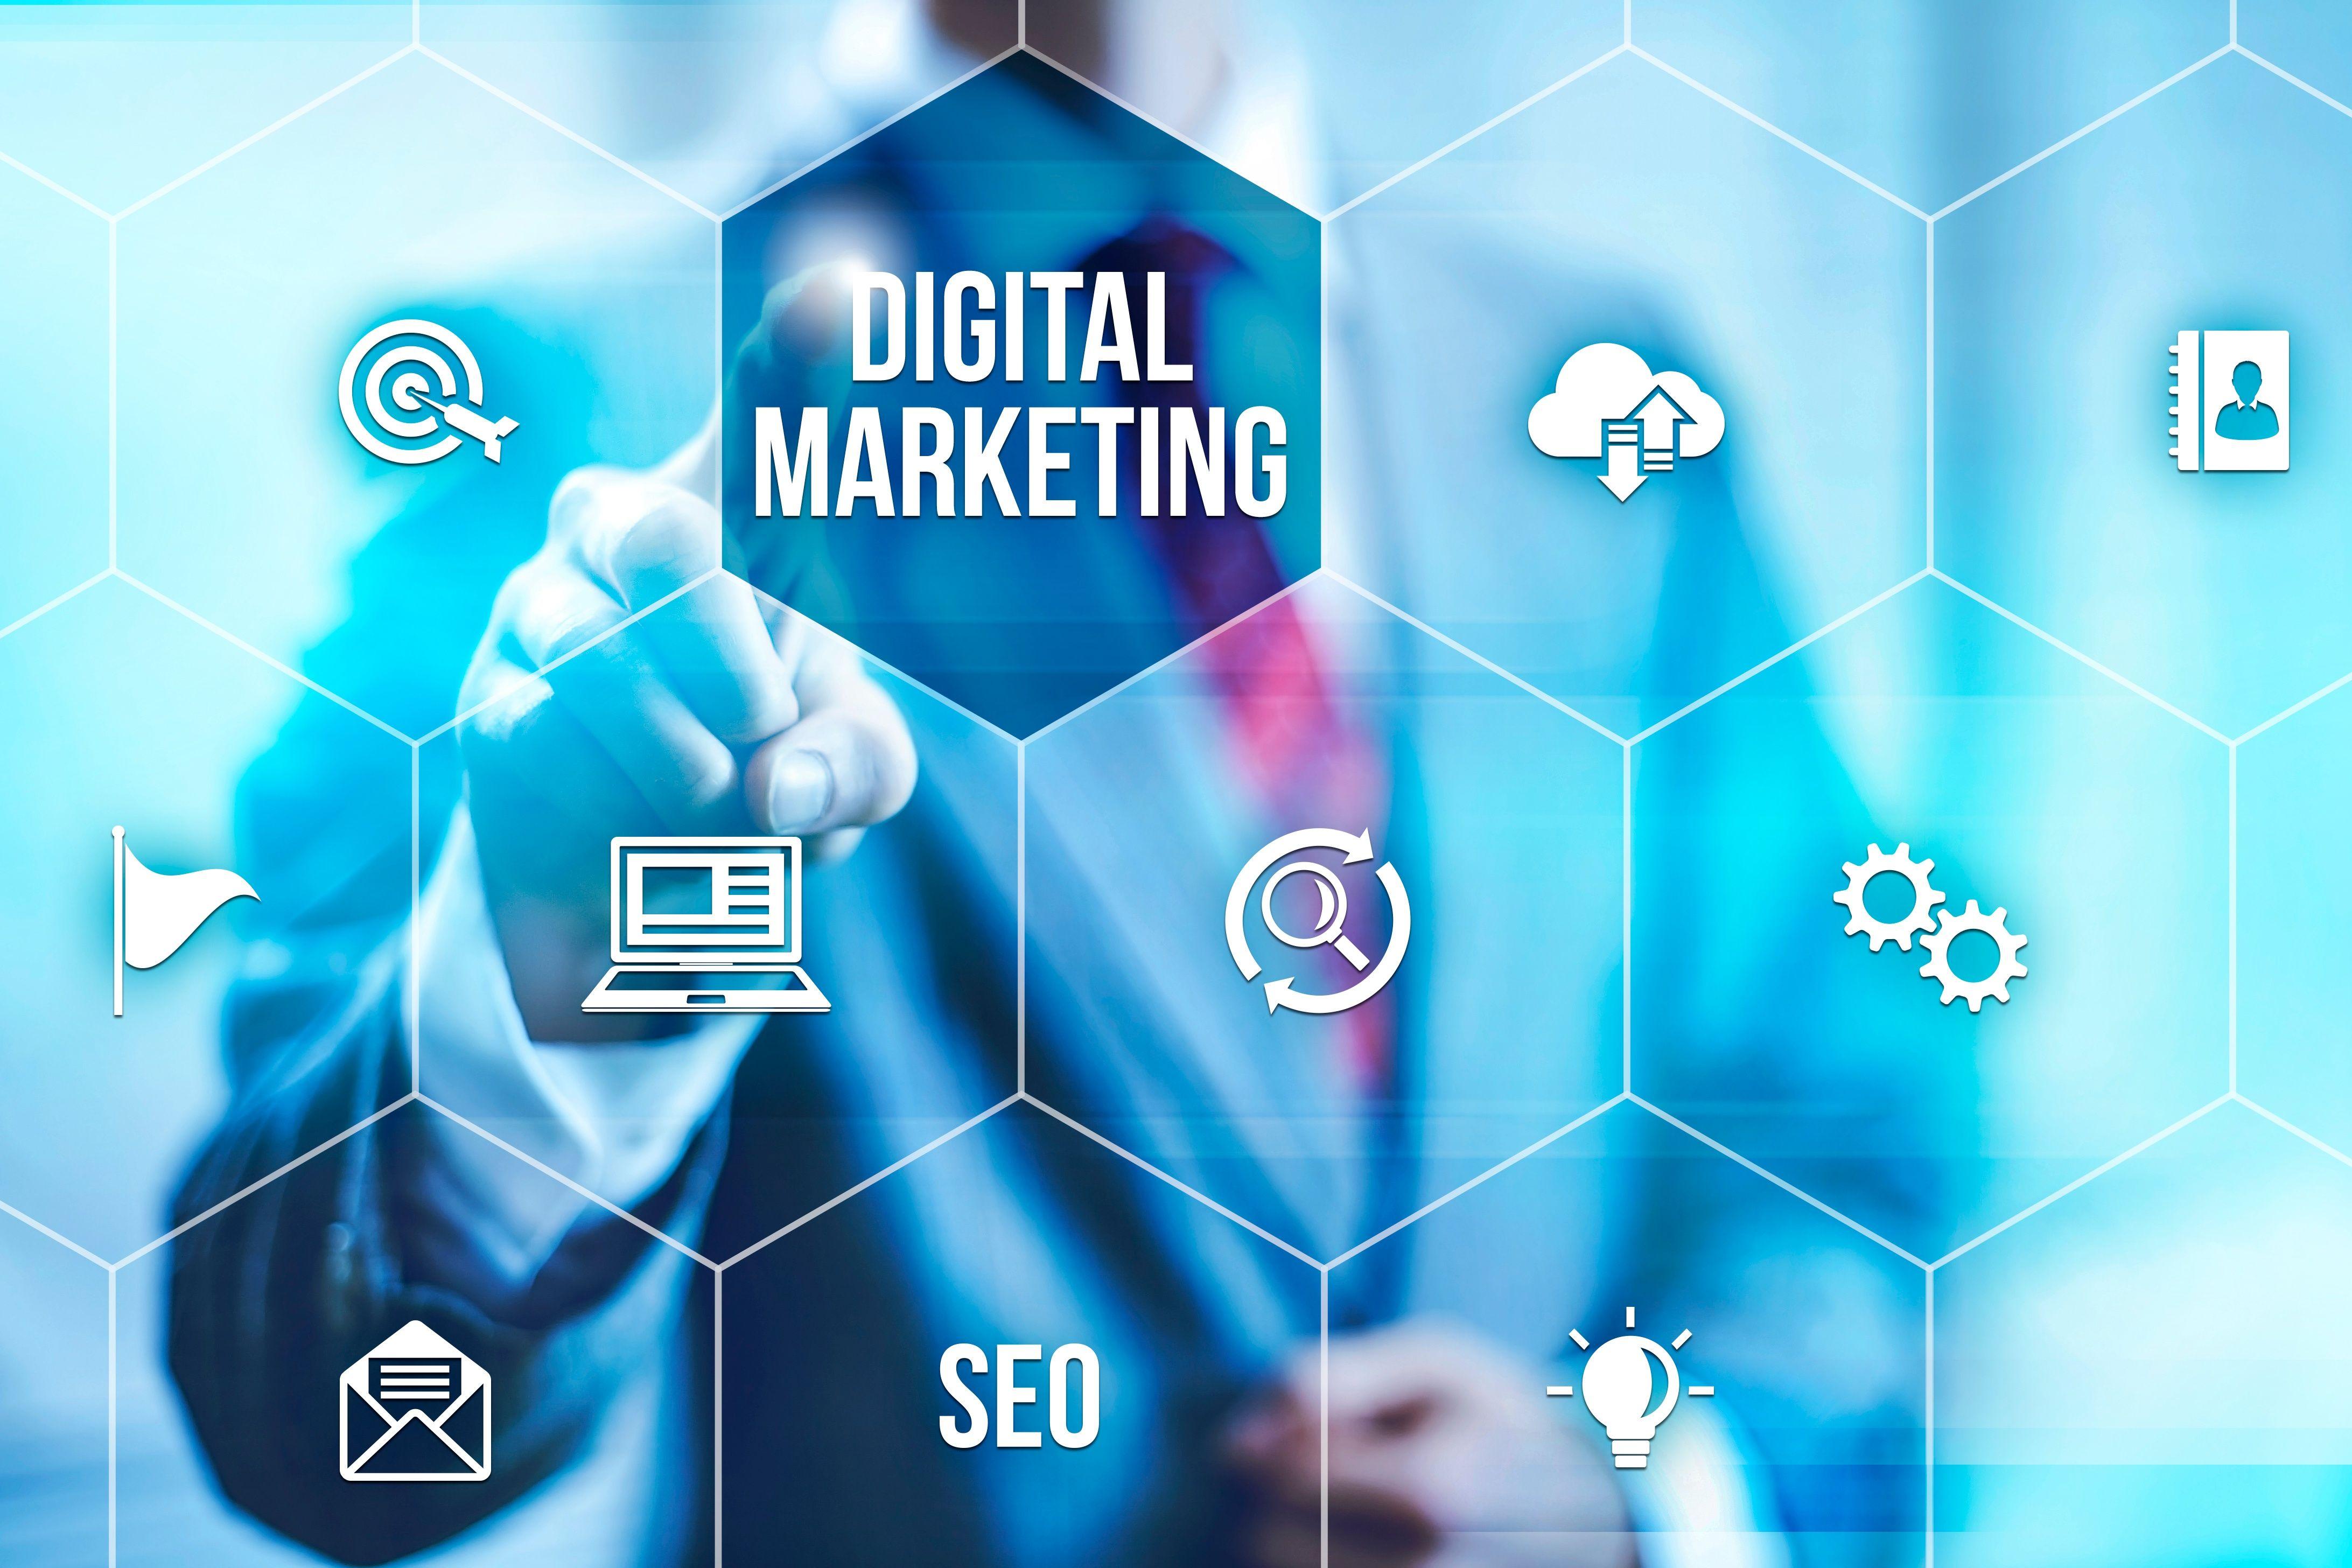 Why Digital Marketing background - Avinash Dangeti